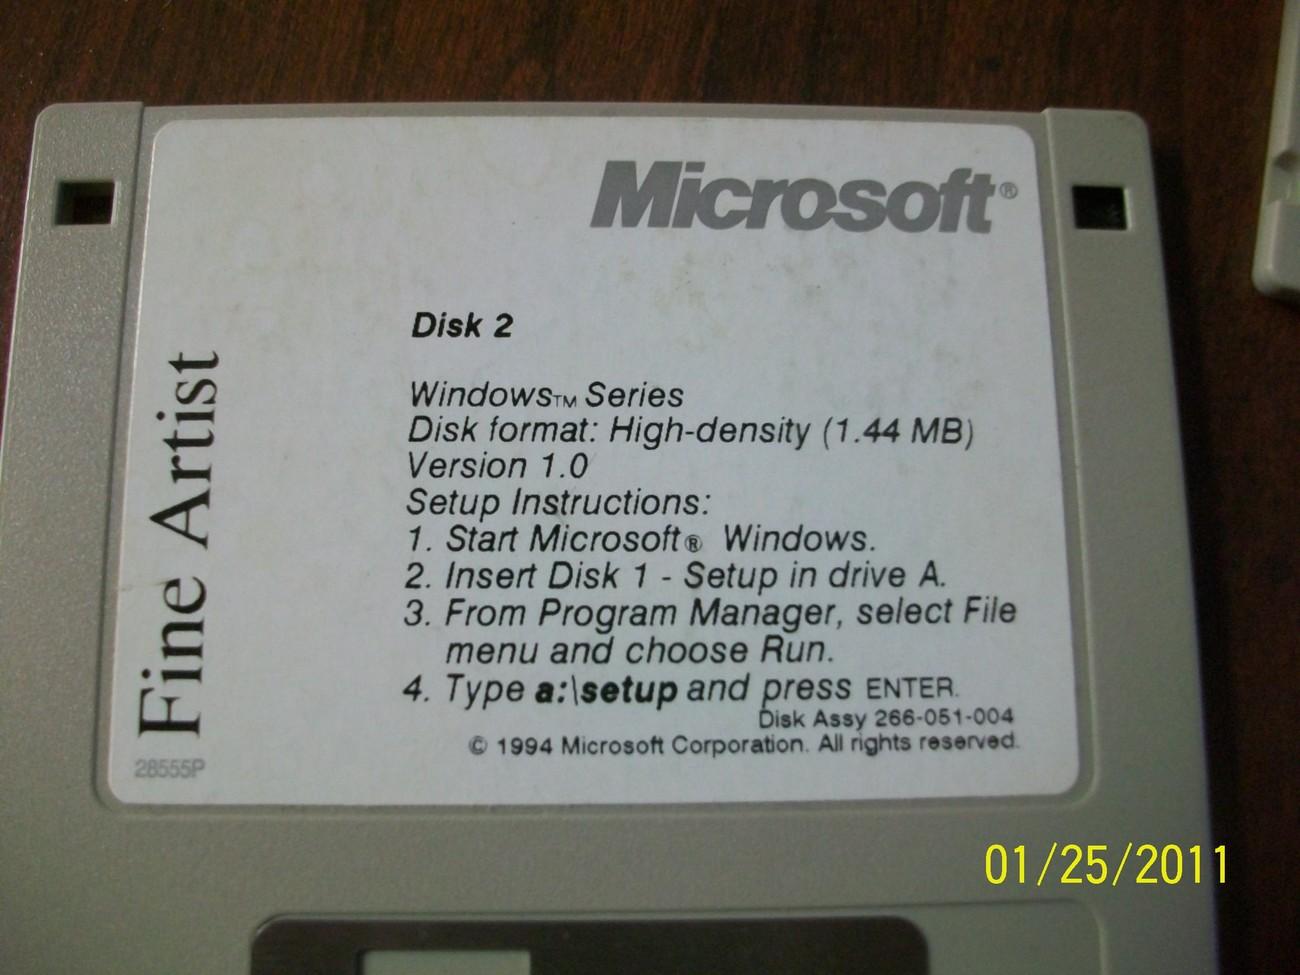 fine artist microsoft 1994, 2 floppy disks